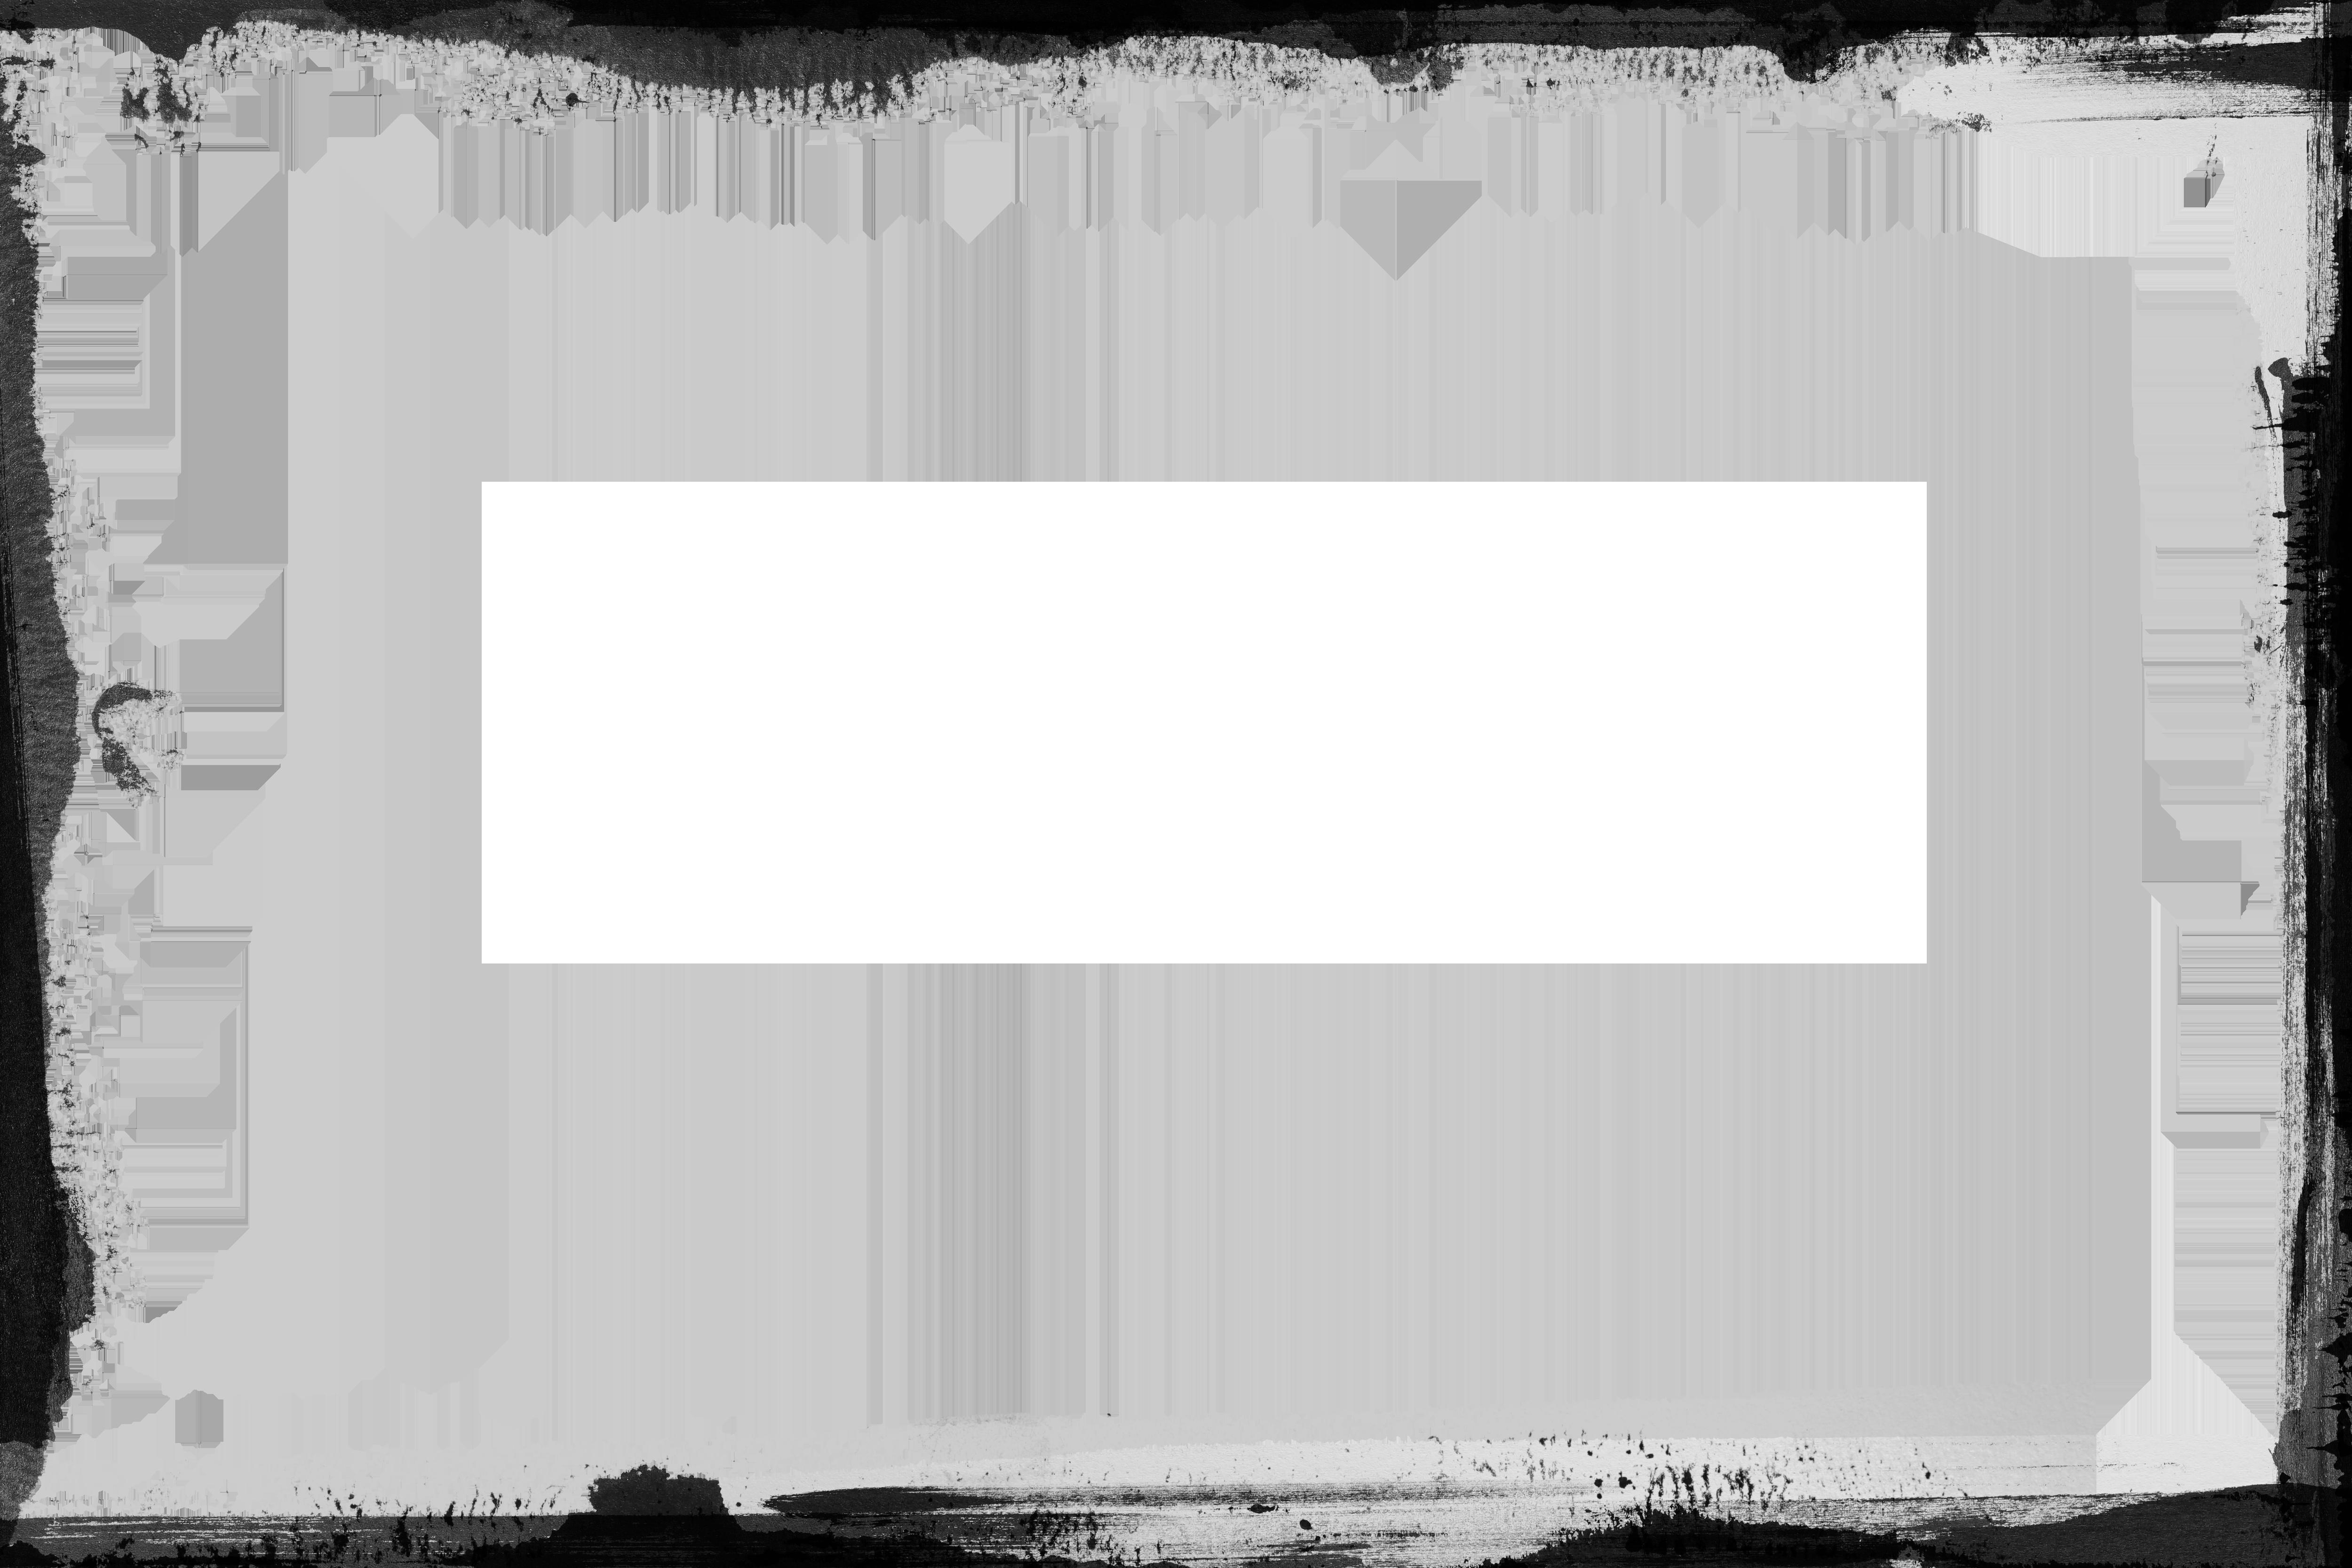 Retro template psdgraphics. Black border png